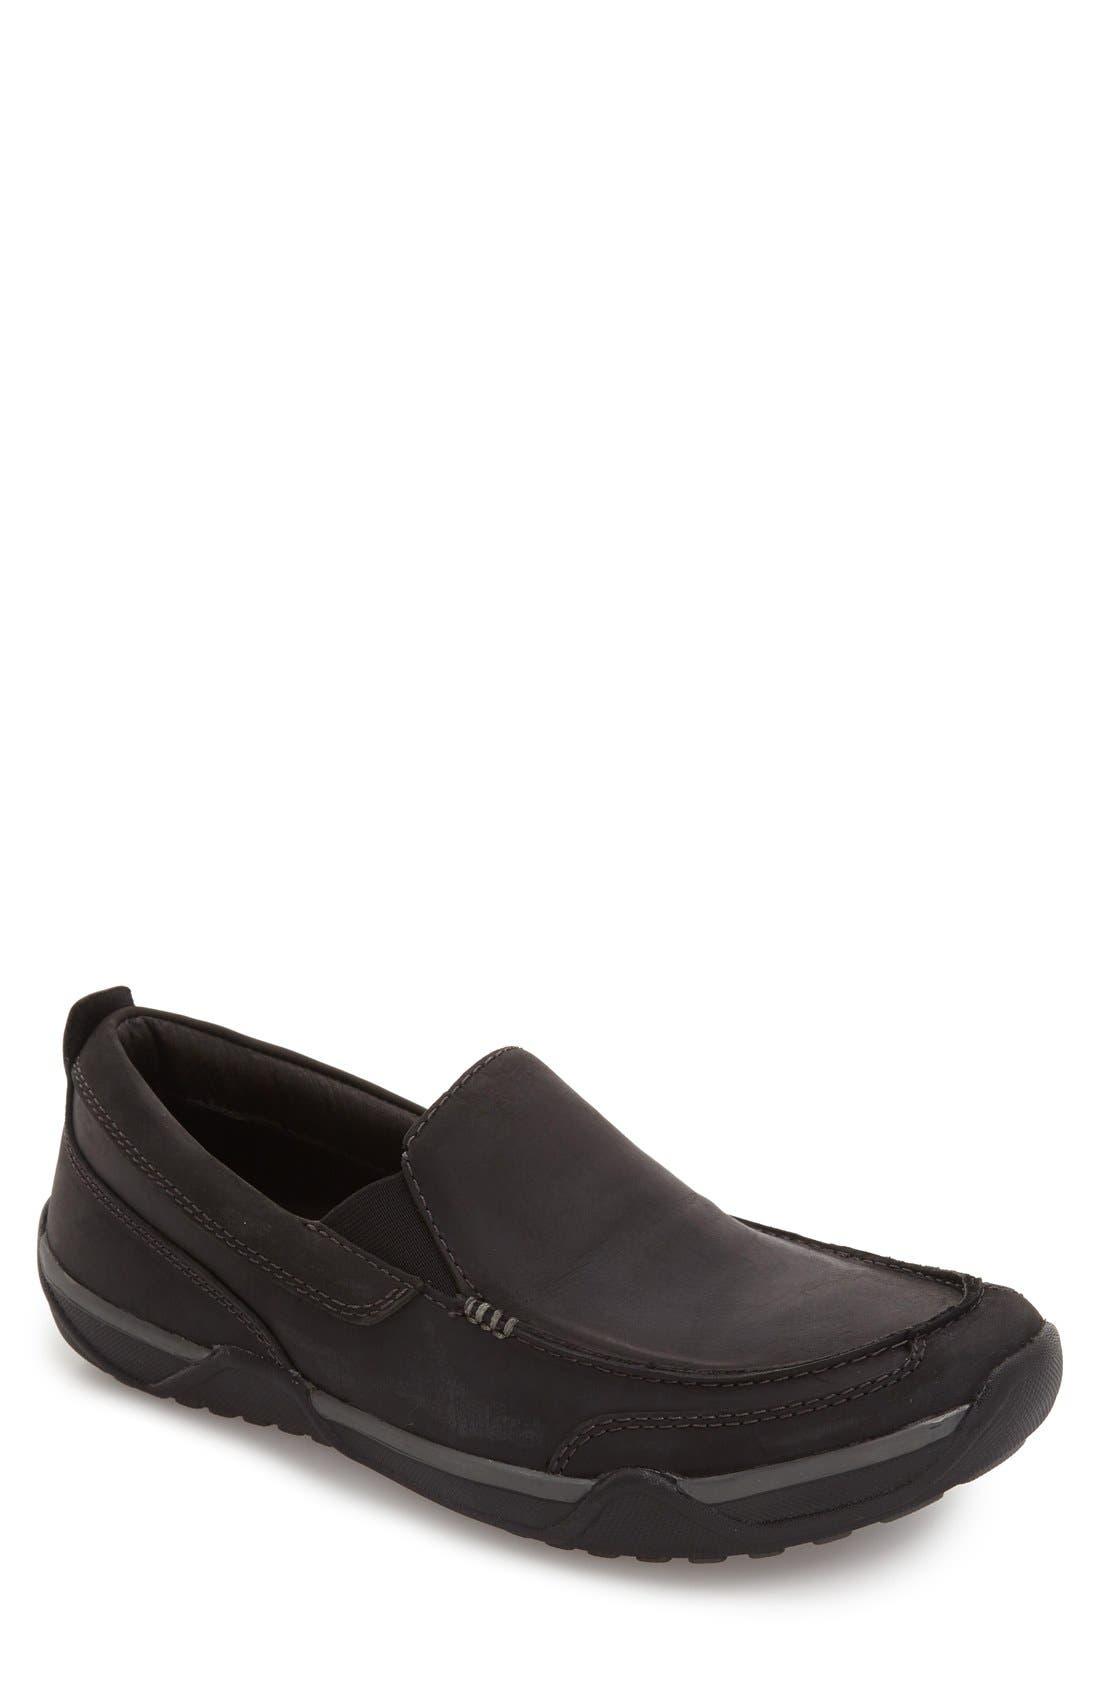 Markis Moc Toe Slip-On,                         Main,                         color, Black Leather